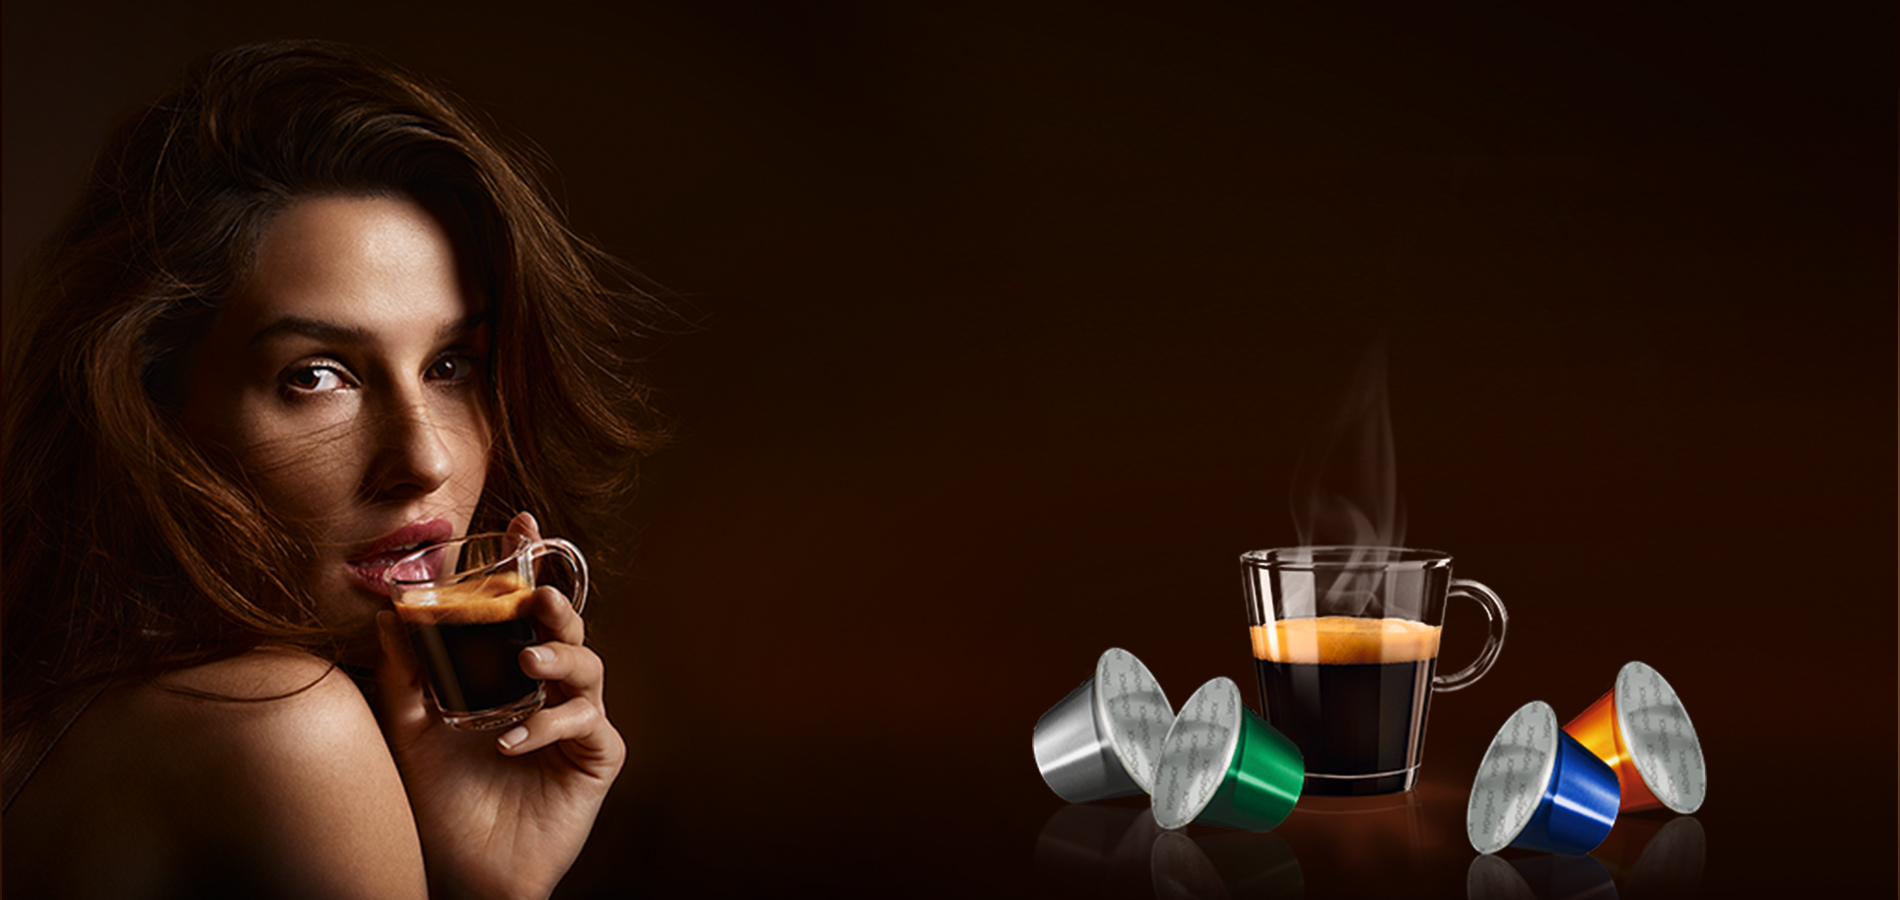 M venpick bietet kapseln f r das nespresso system j j for Nespresso professional kapseln